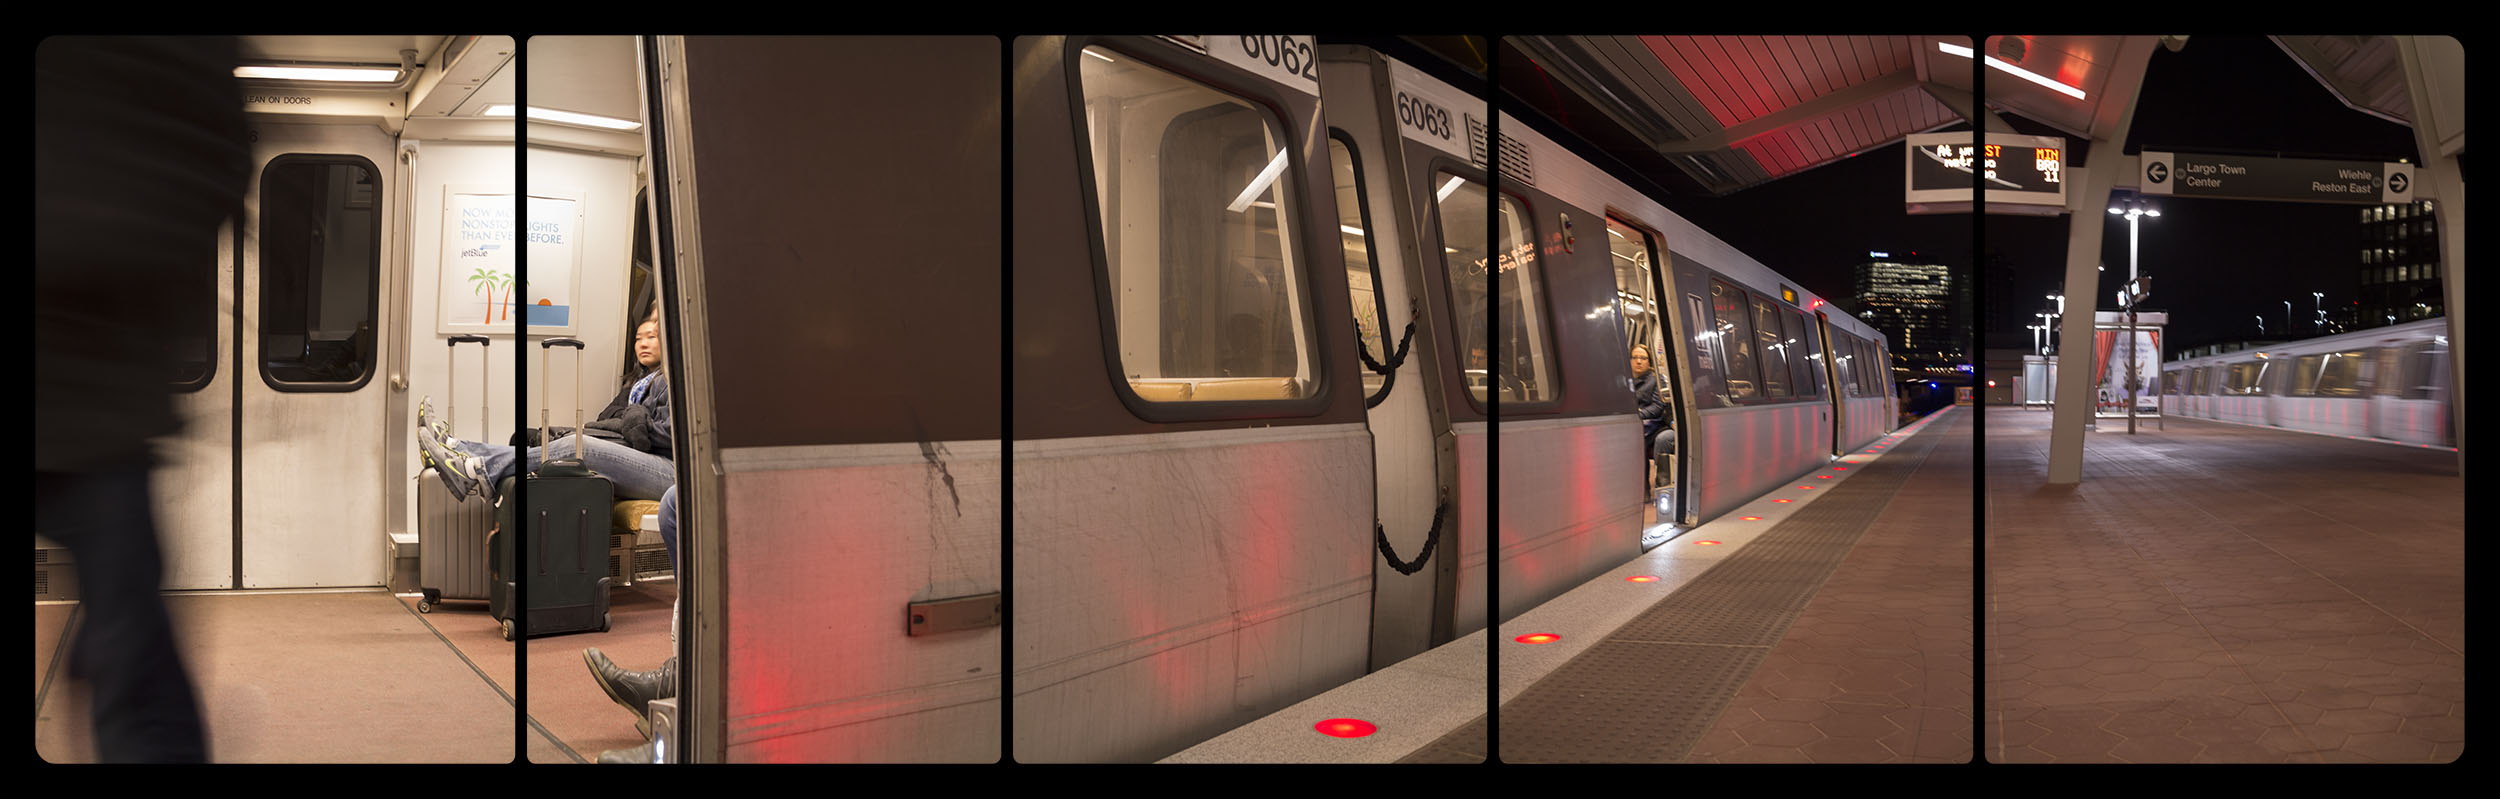 Metro Rail, McLean,11-29-2014,4276-4280